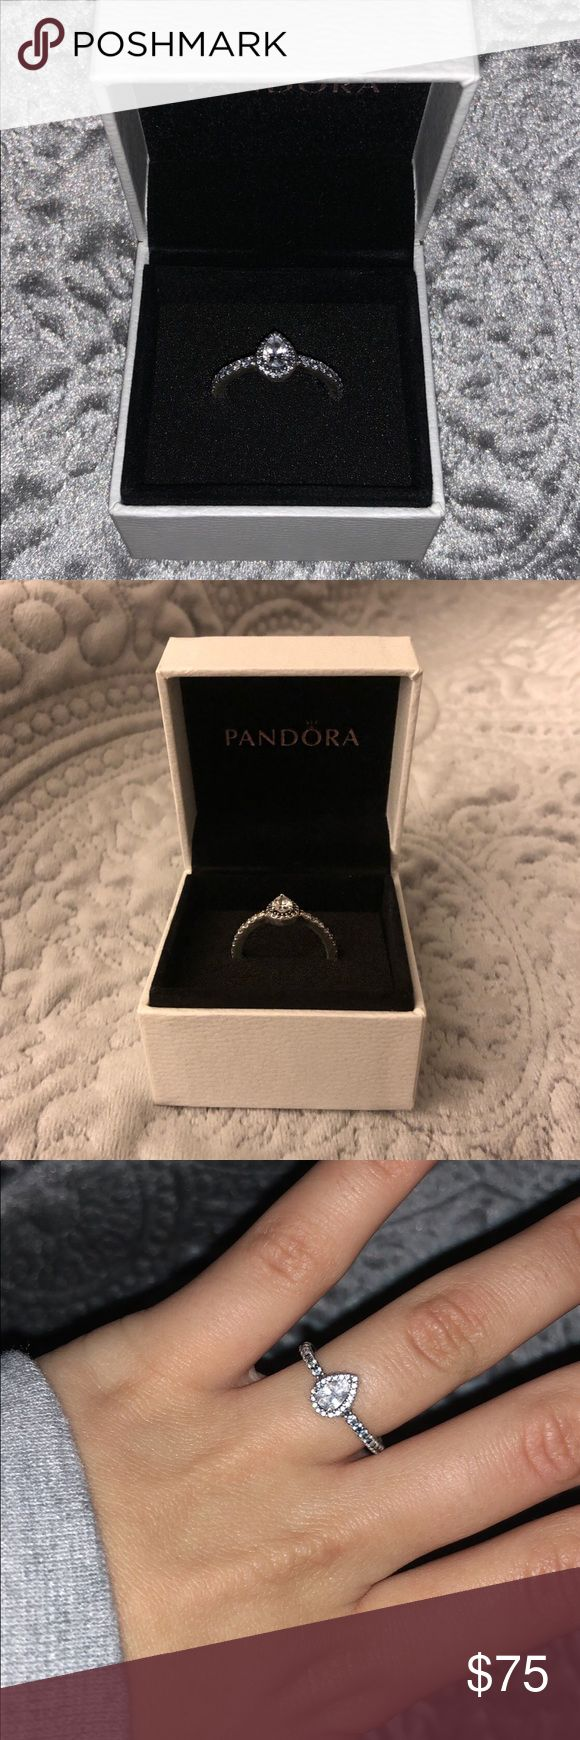 Pandora Ring Teardrop diamond ring from pandora, still in box... worn once for a wedding:)make offers!!! Pandora Jewelry Rings #pandoraJewelry